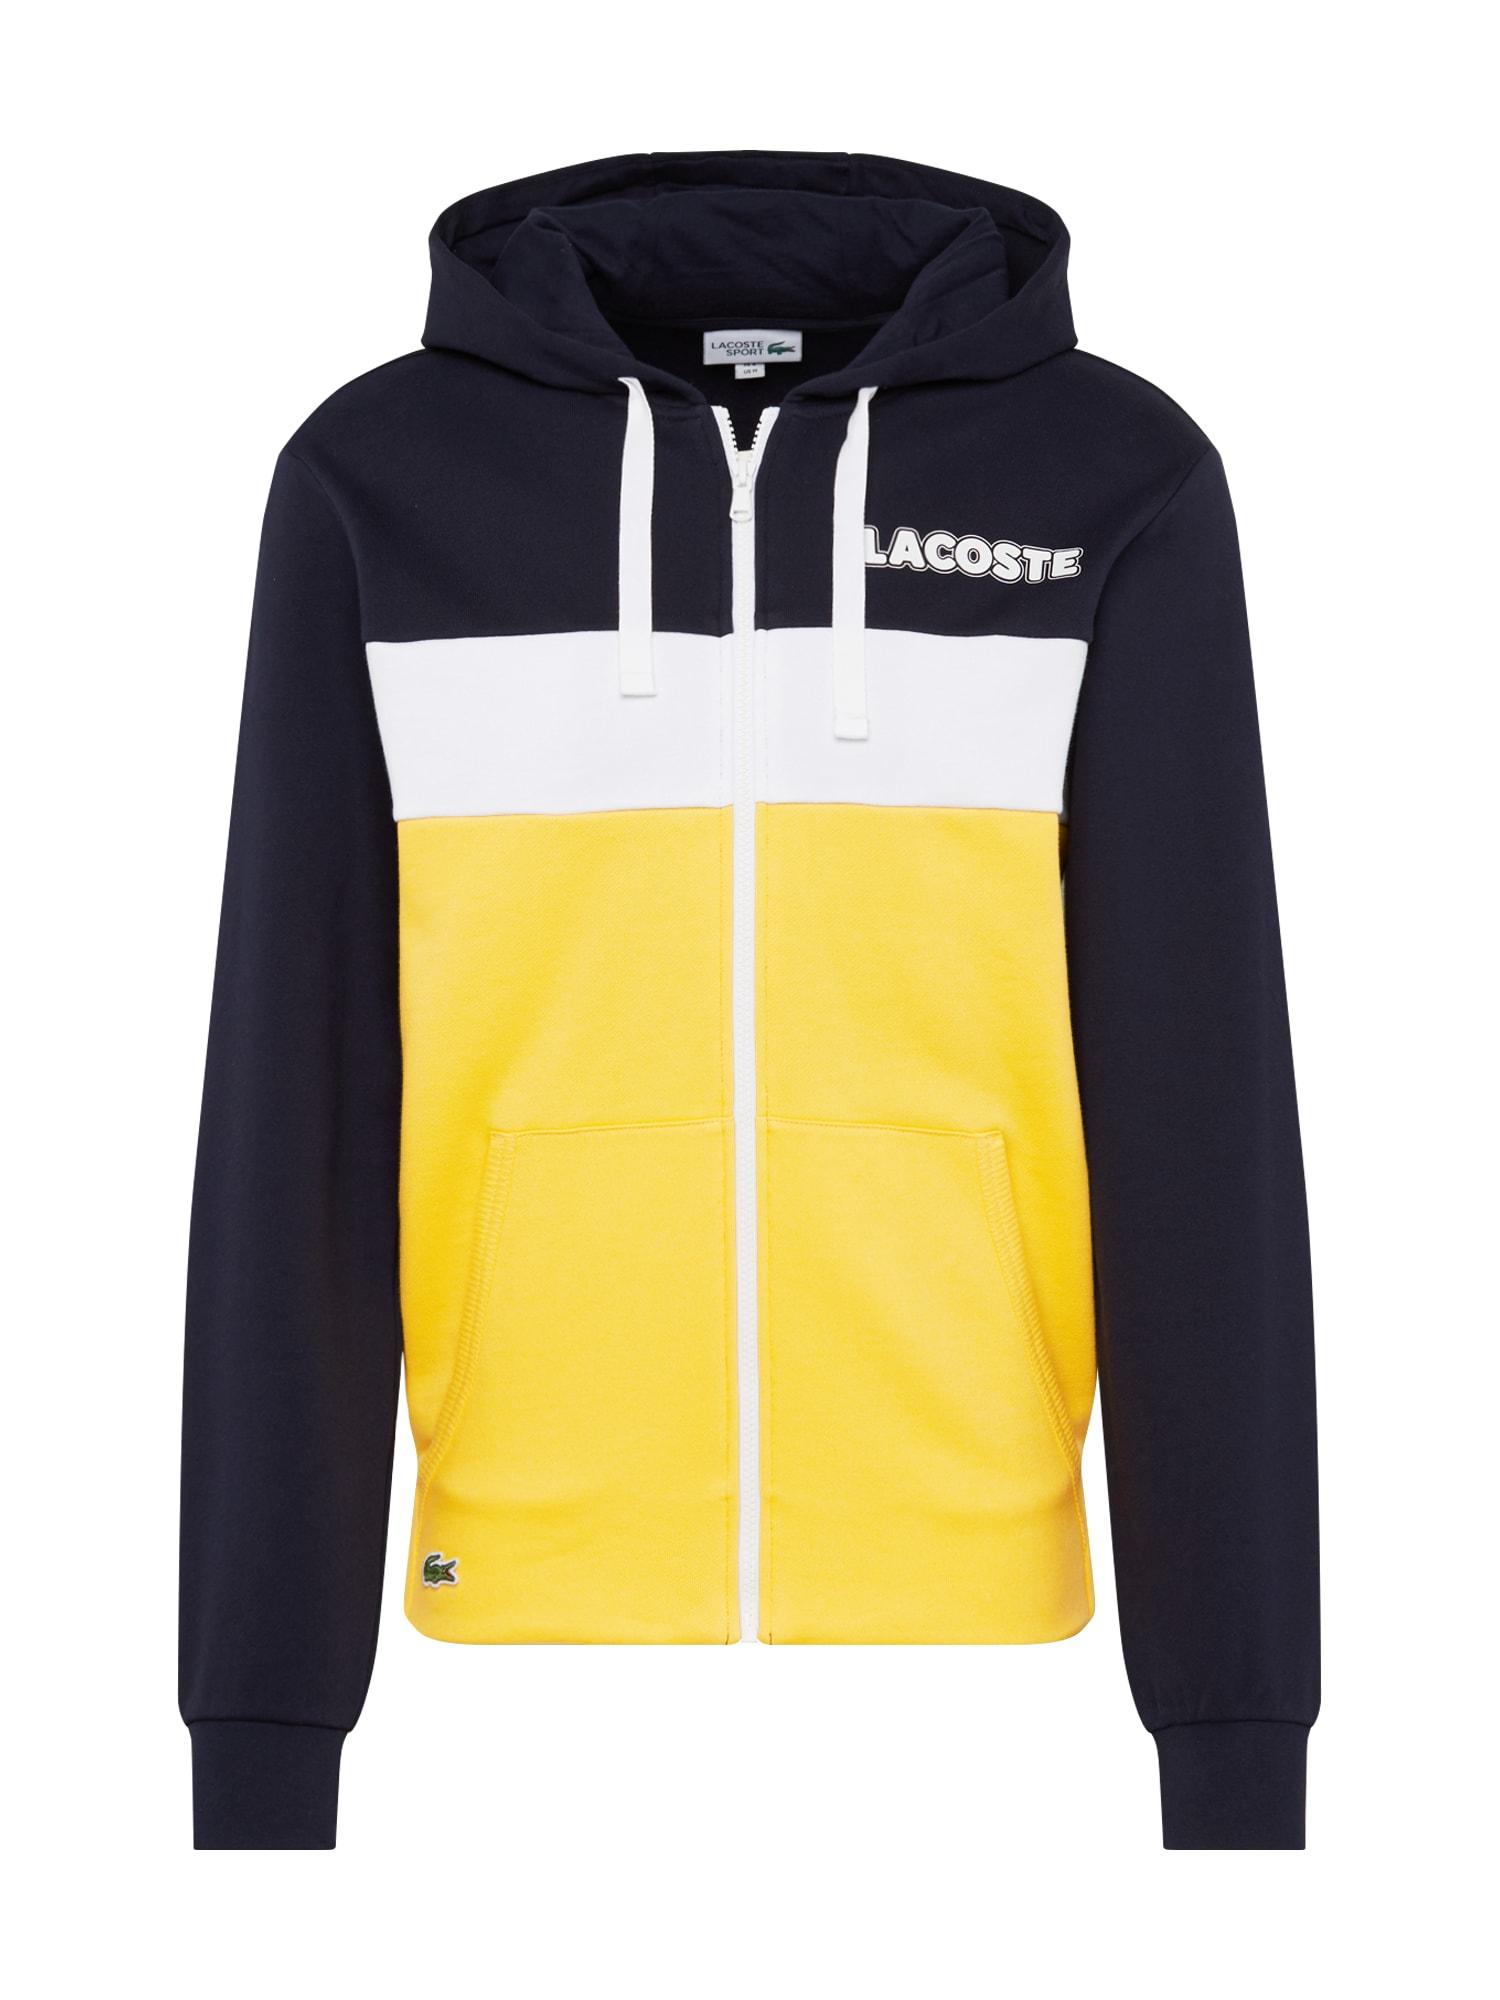 LACOSTE Džemperis tamsiai mėlyna / geltona / balta